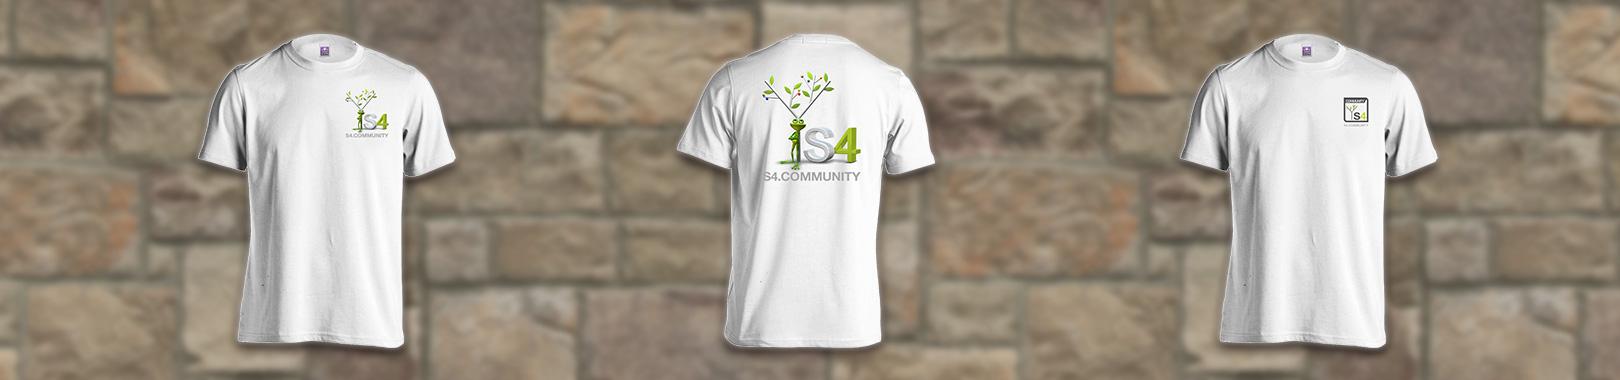 S4-Shirts Shop